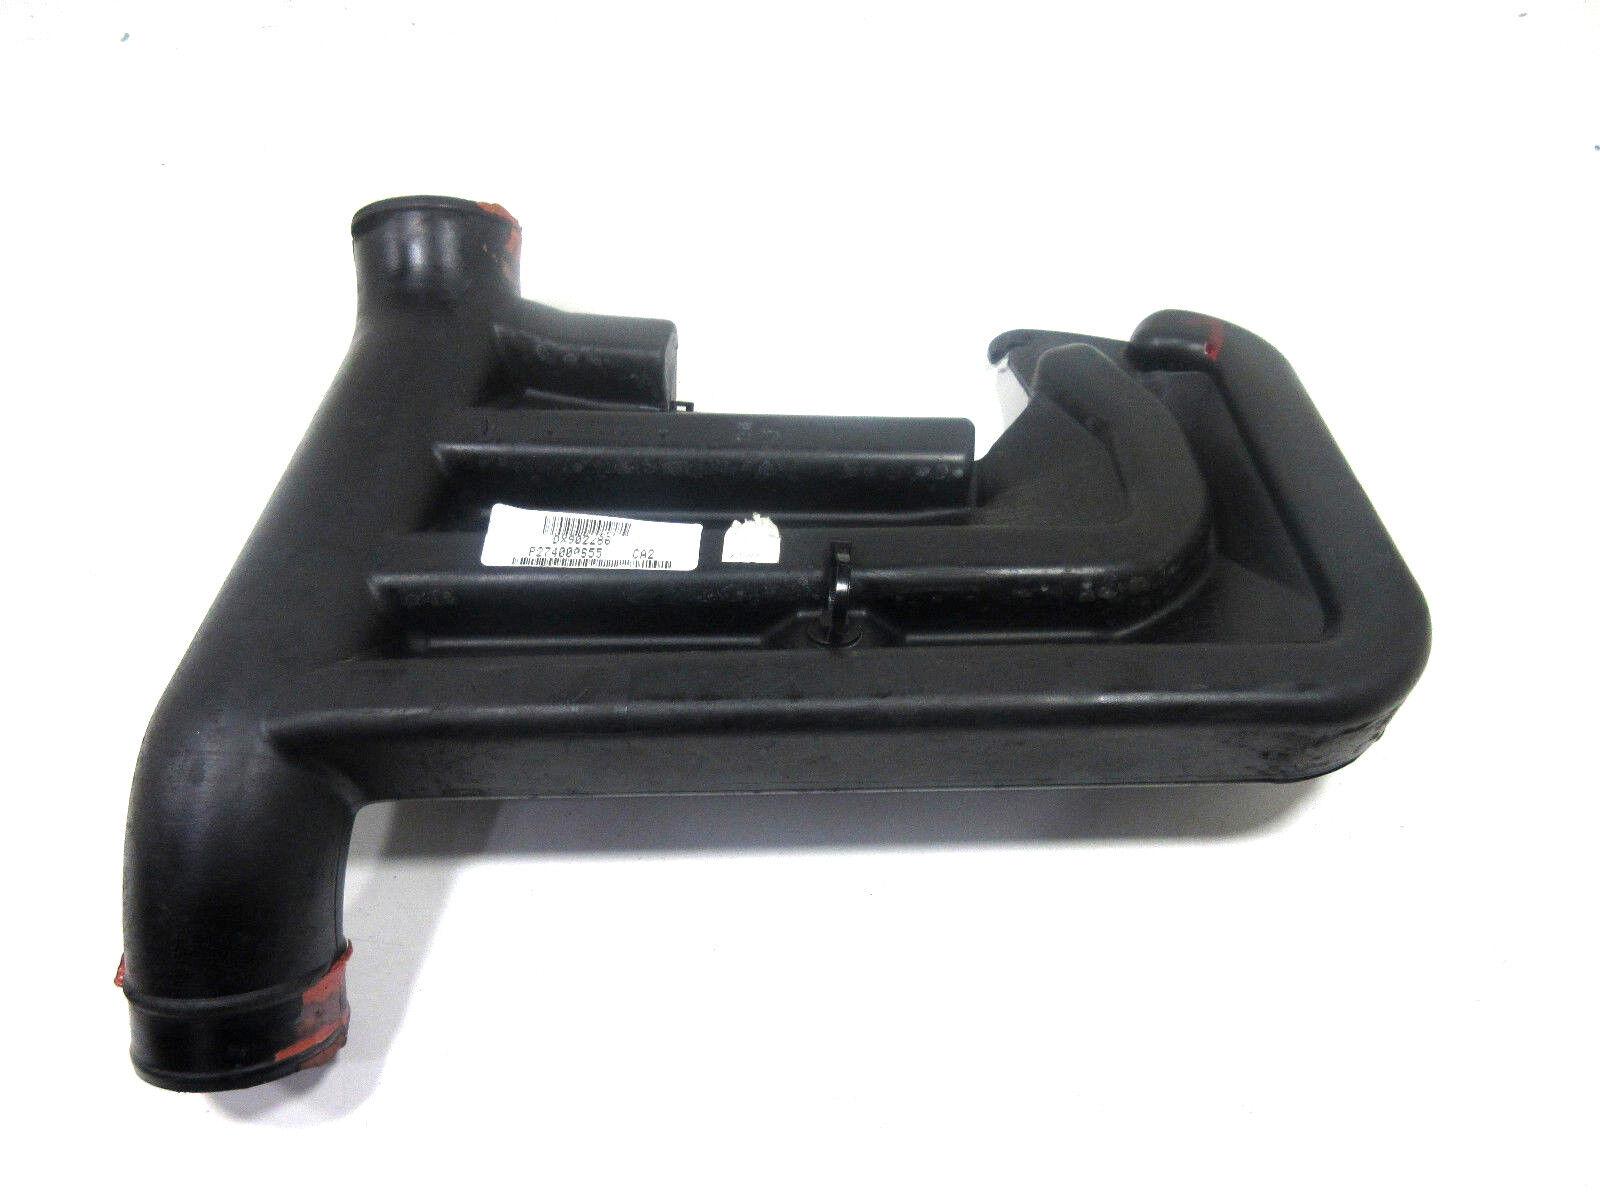 Seadoo Exhaust Left Side Resonator 1998-2002 GTX RFI & GTX Limited  274000655